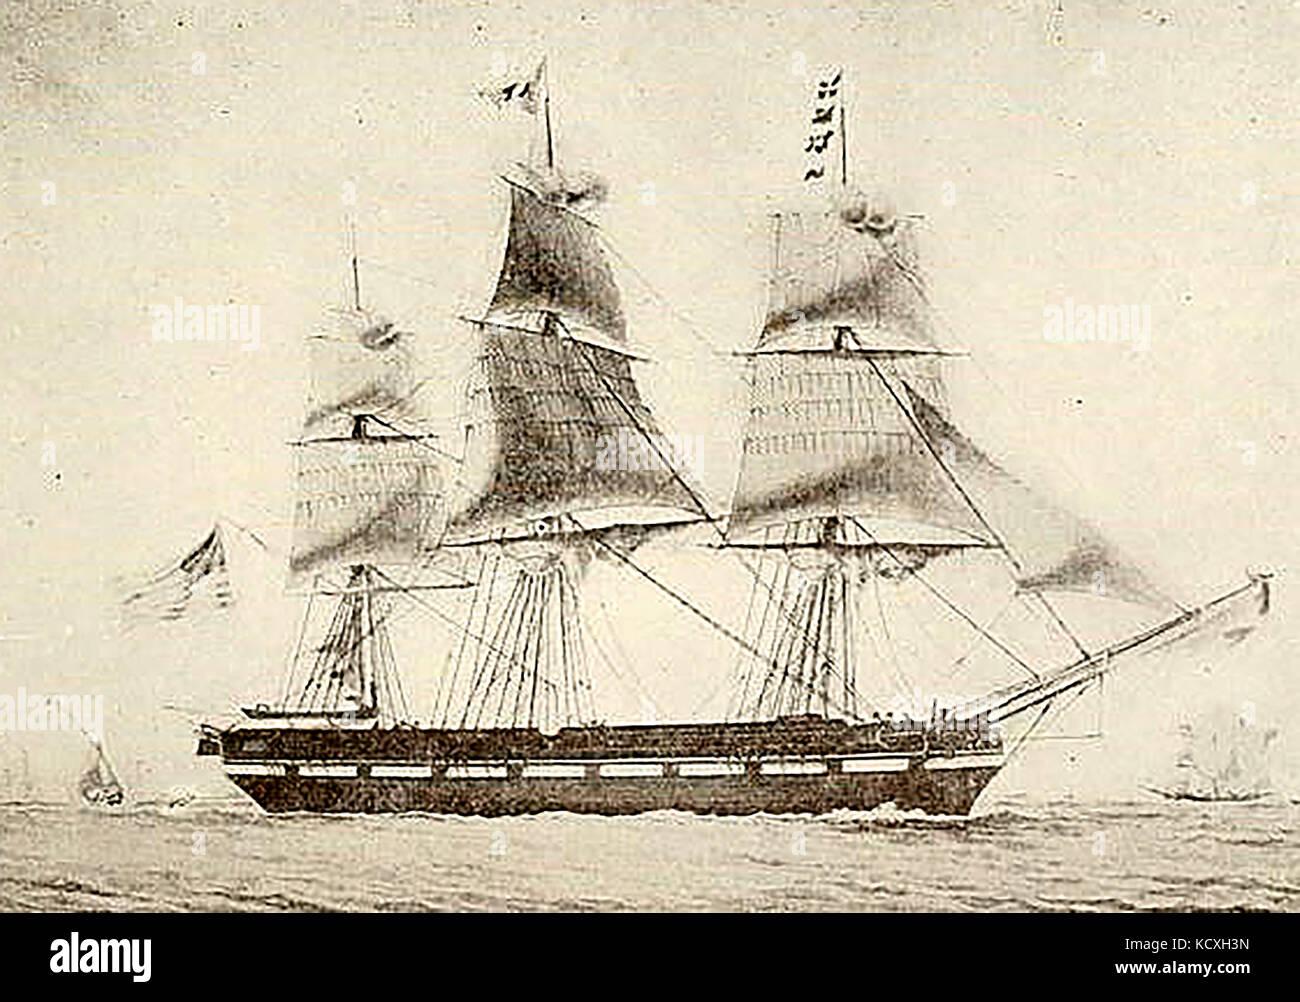 The  306 ton U.S. ship DROMO built Plymouth (USA) 1828. Still afloat 1836 - Stock Image